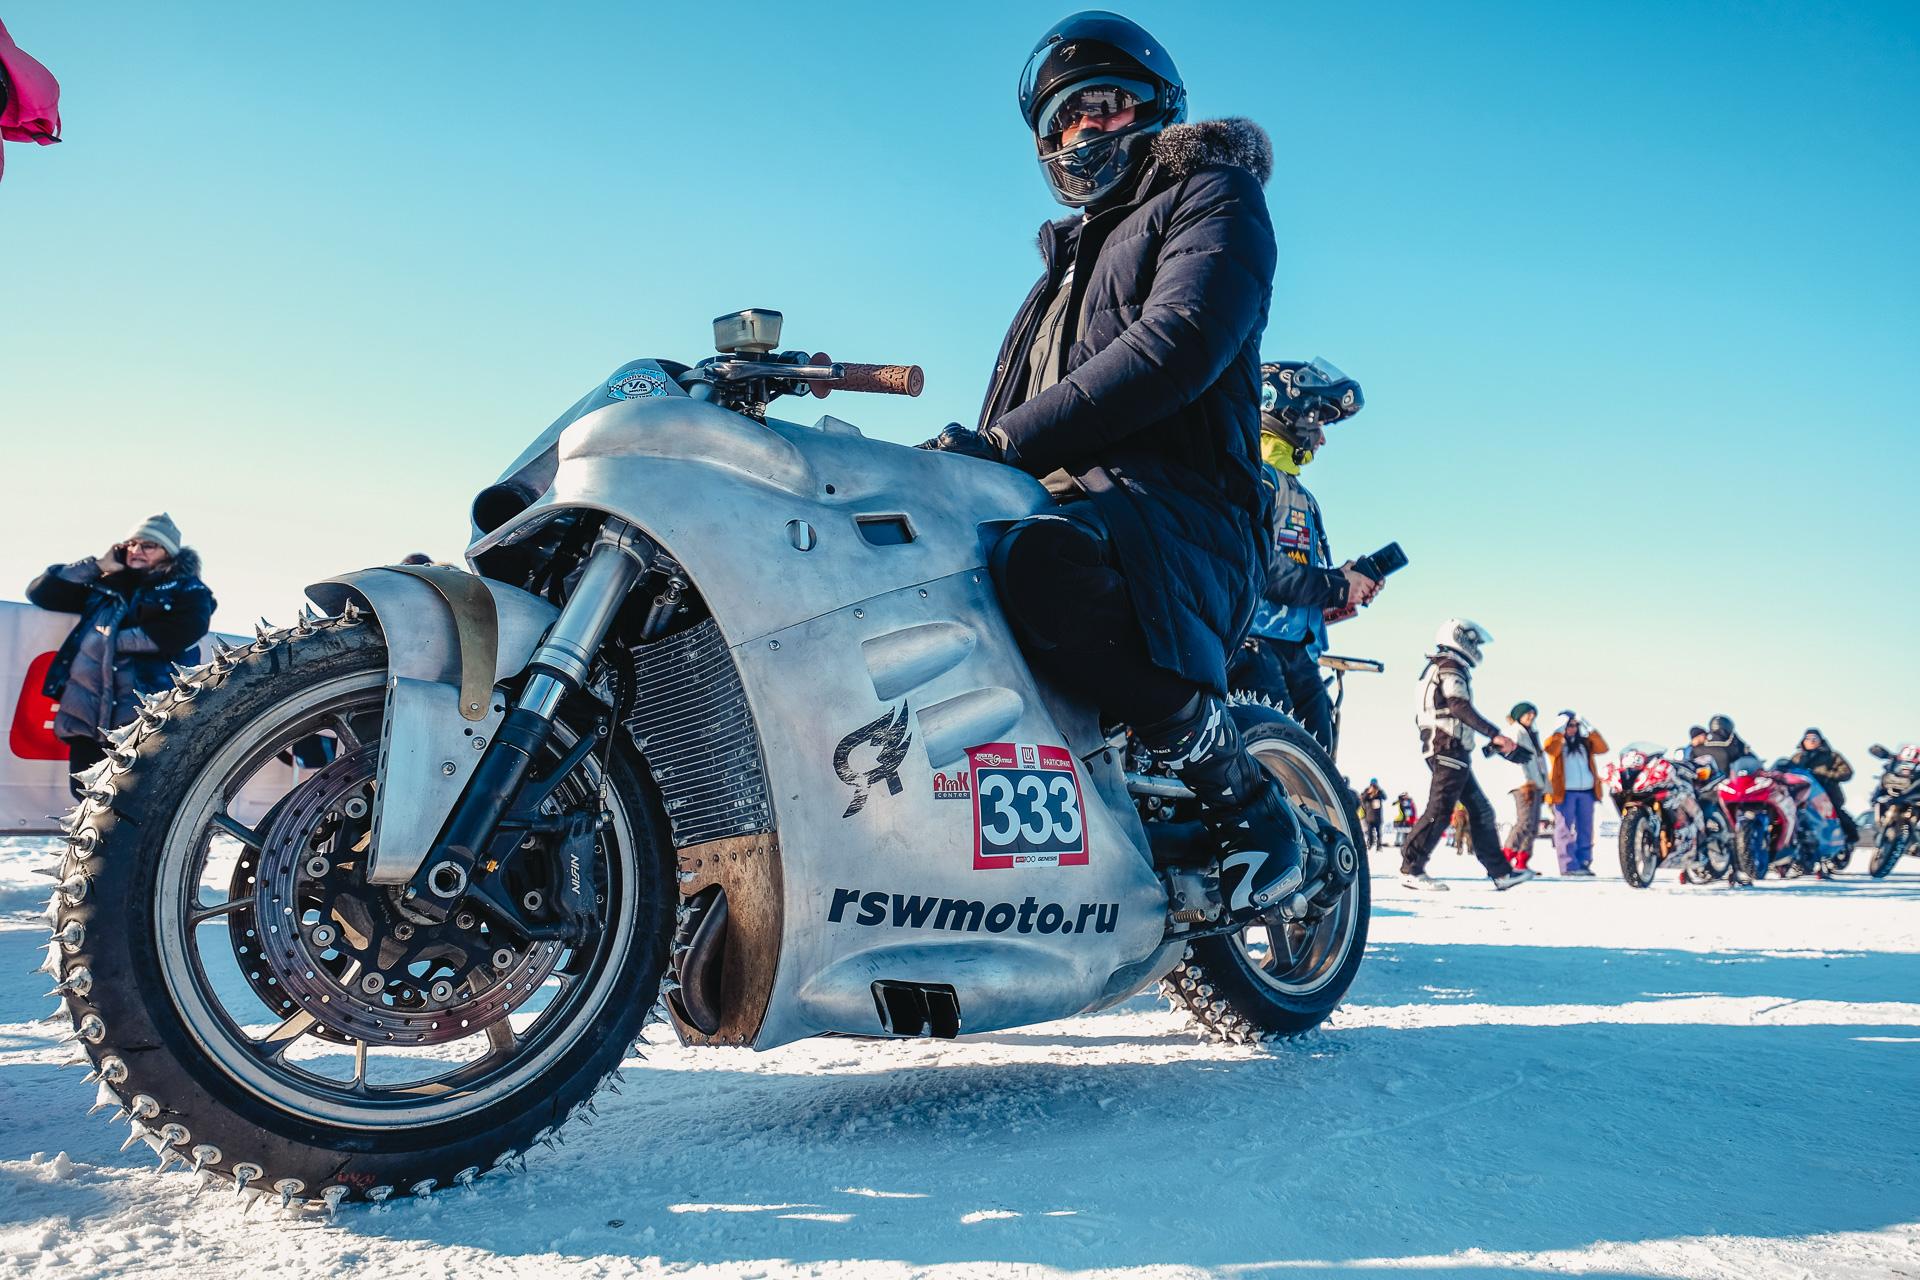 Байкальская Миля 2020 - Татаринов Ярослав Сергеевич Kawasaki GTR 1400 2008 RSW Moto